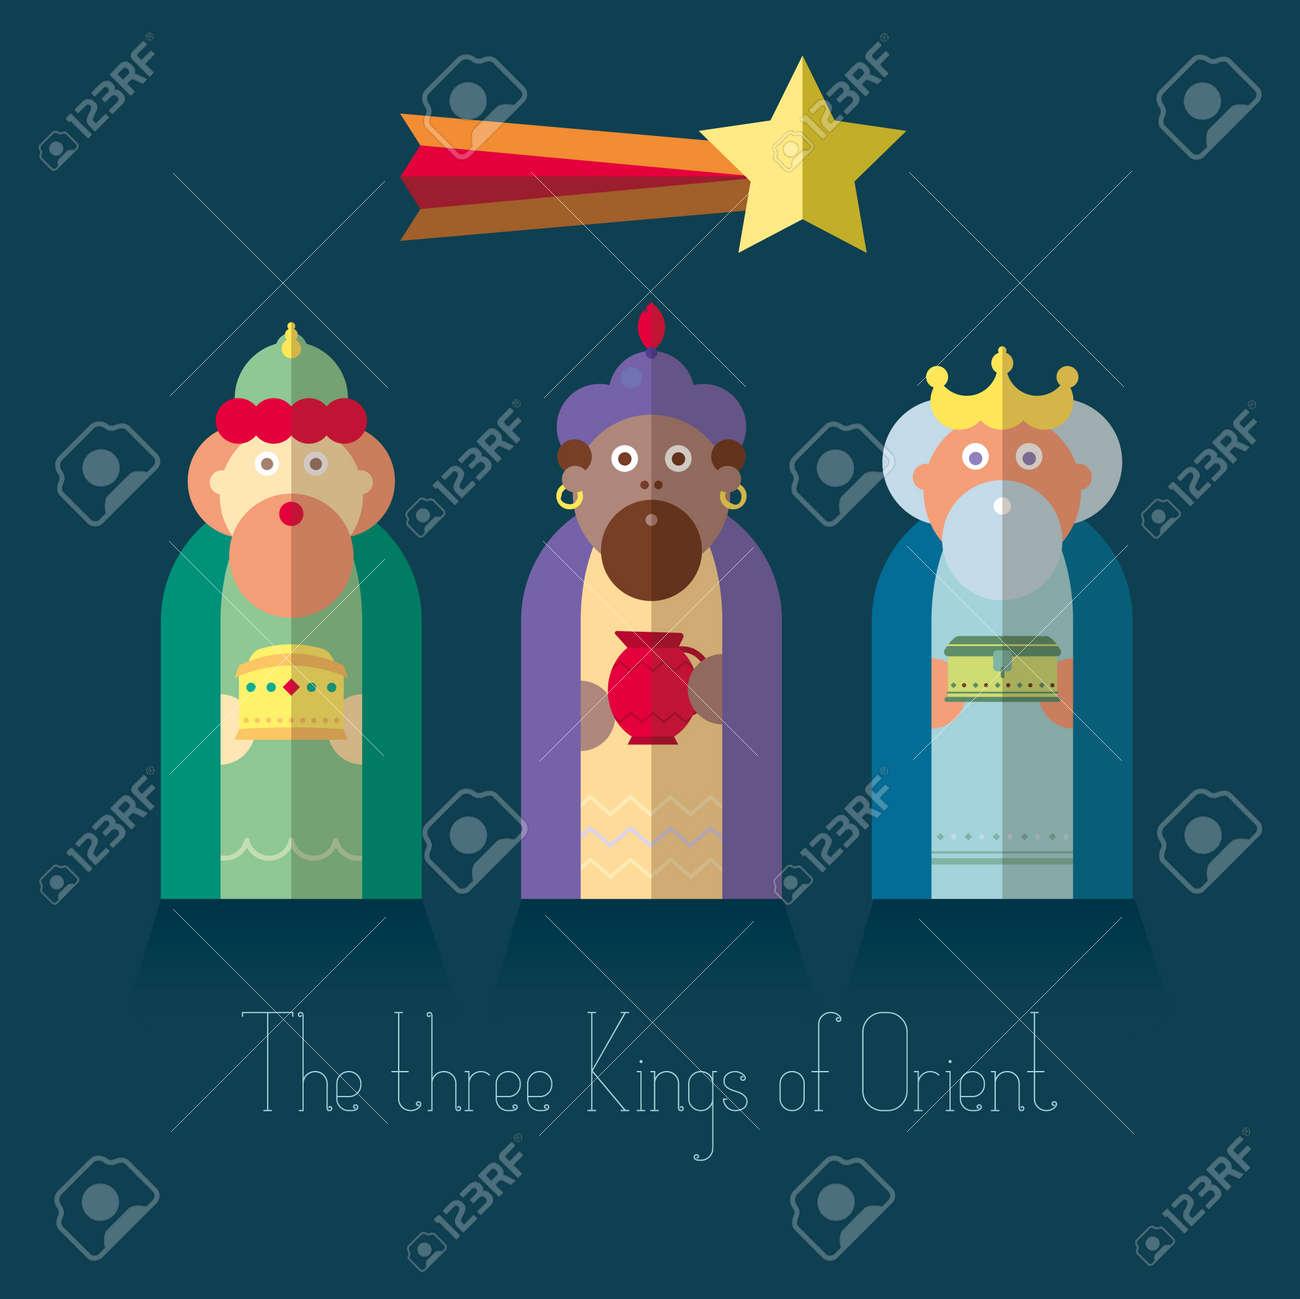 The three Kings of Orient wisemen - 33719002